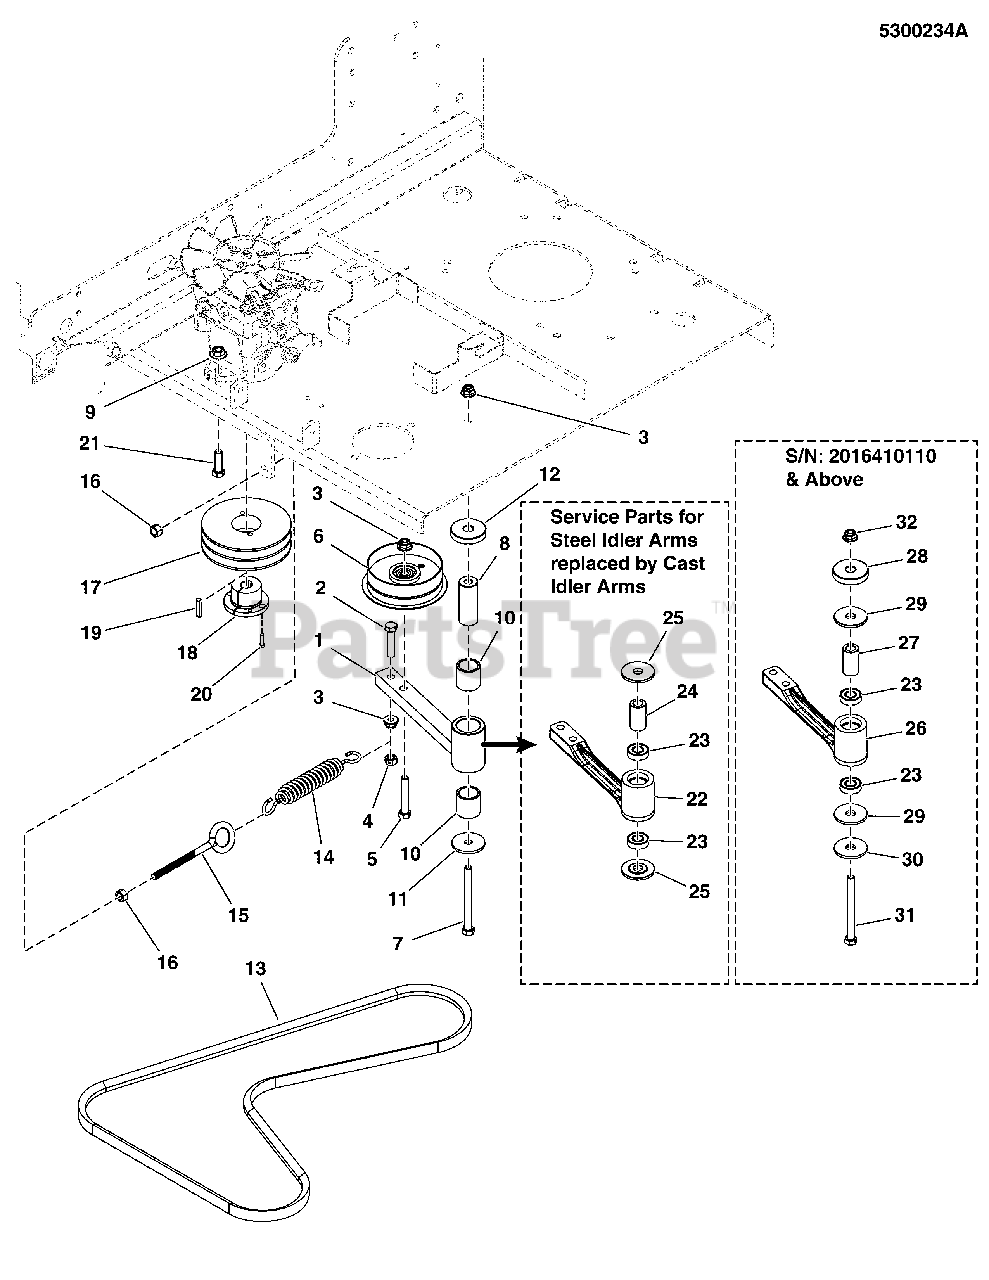 Simplicity Cobalt Wiring Diagram 2690479